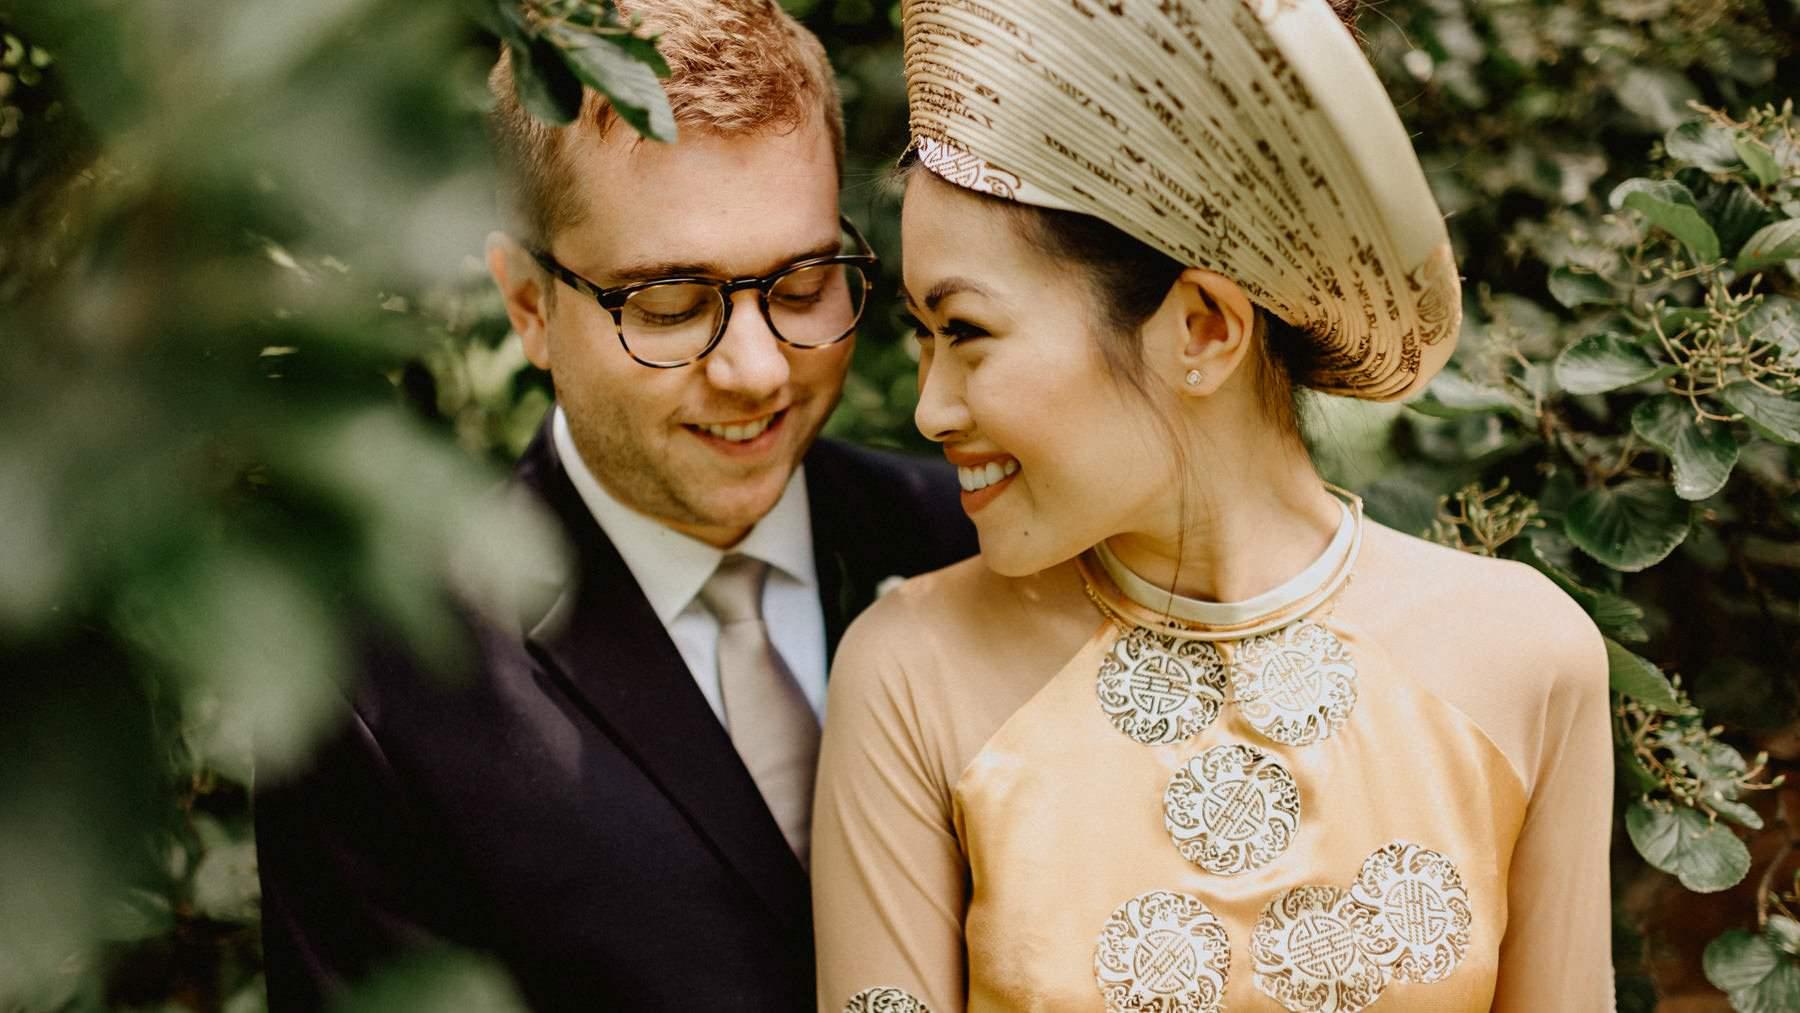 Appleford-estate-wedding-33.jpg